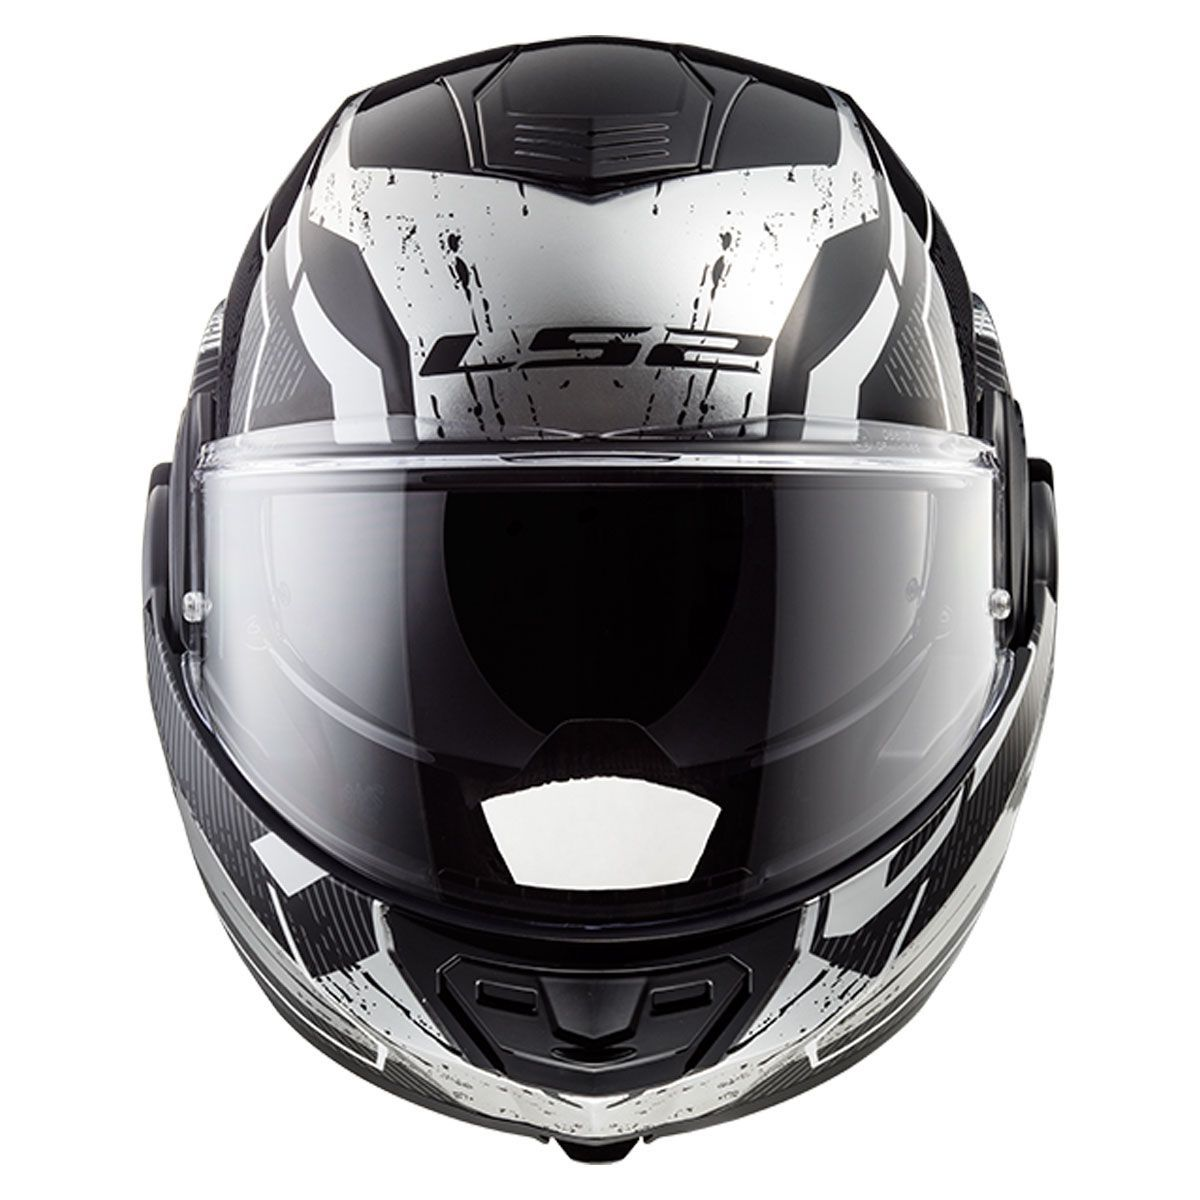 Capacete LS2 FF399 Valiant Roboto C/ VISEIRA SOLAR Articulado  - Nova Centro Boutique Roupas para Motociclistas